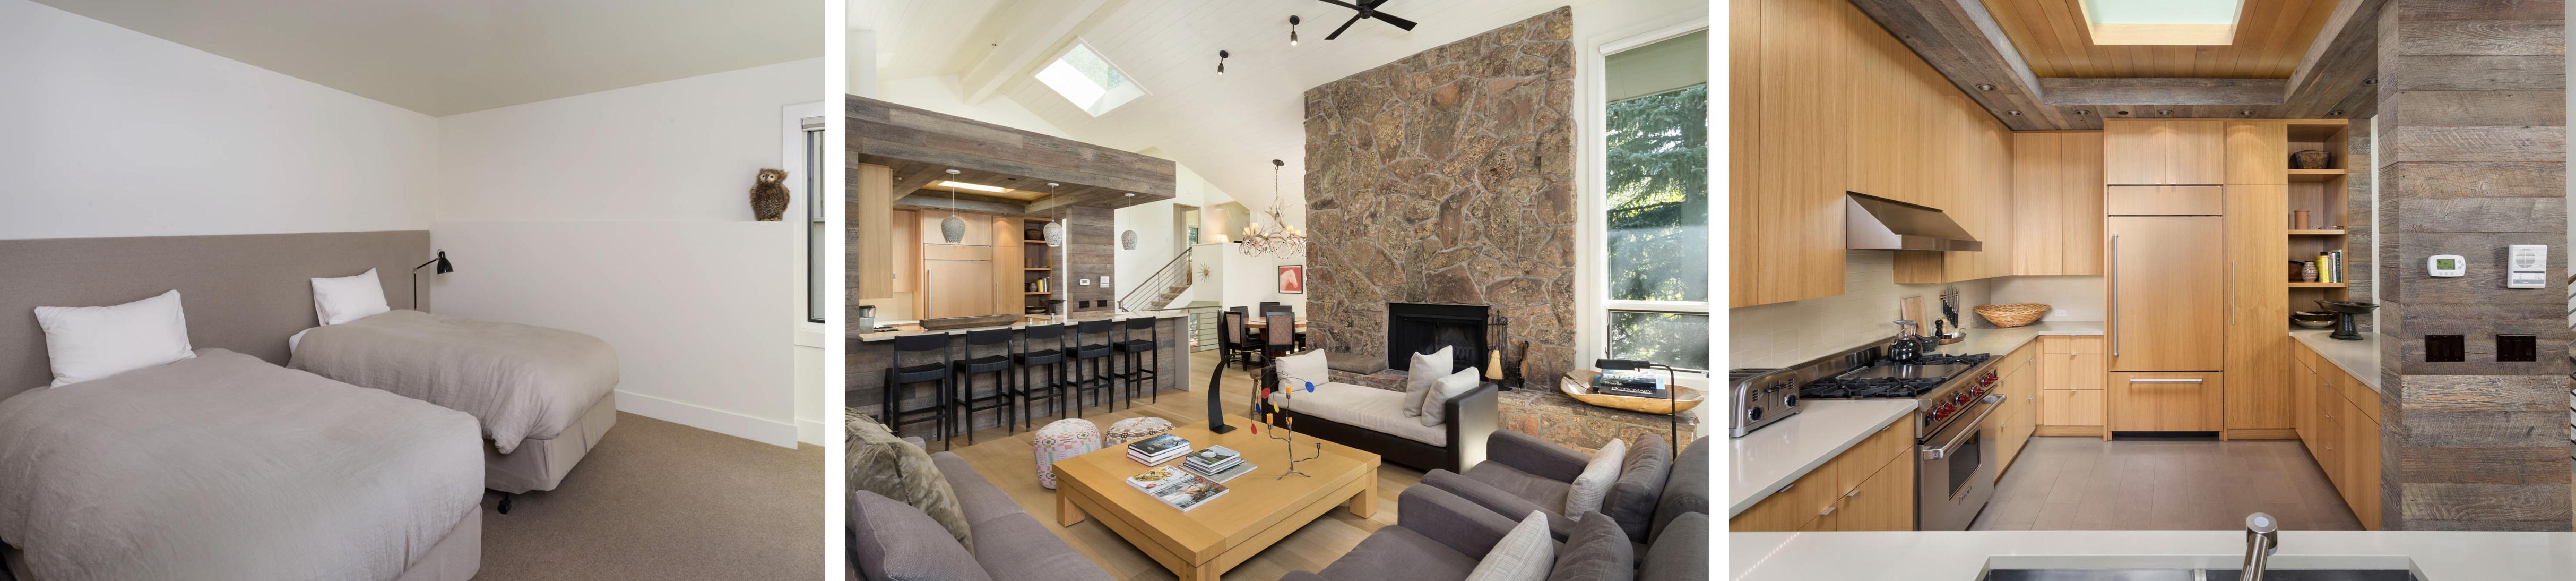 105 West Hyman Aspen vacation rental frias properties